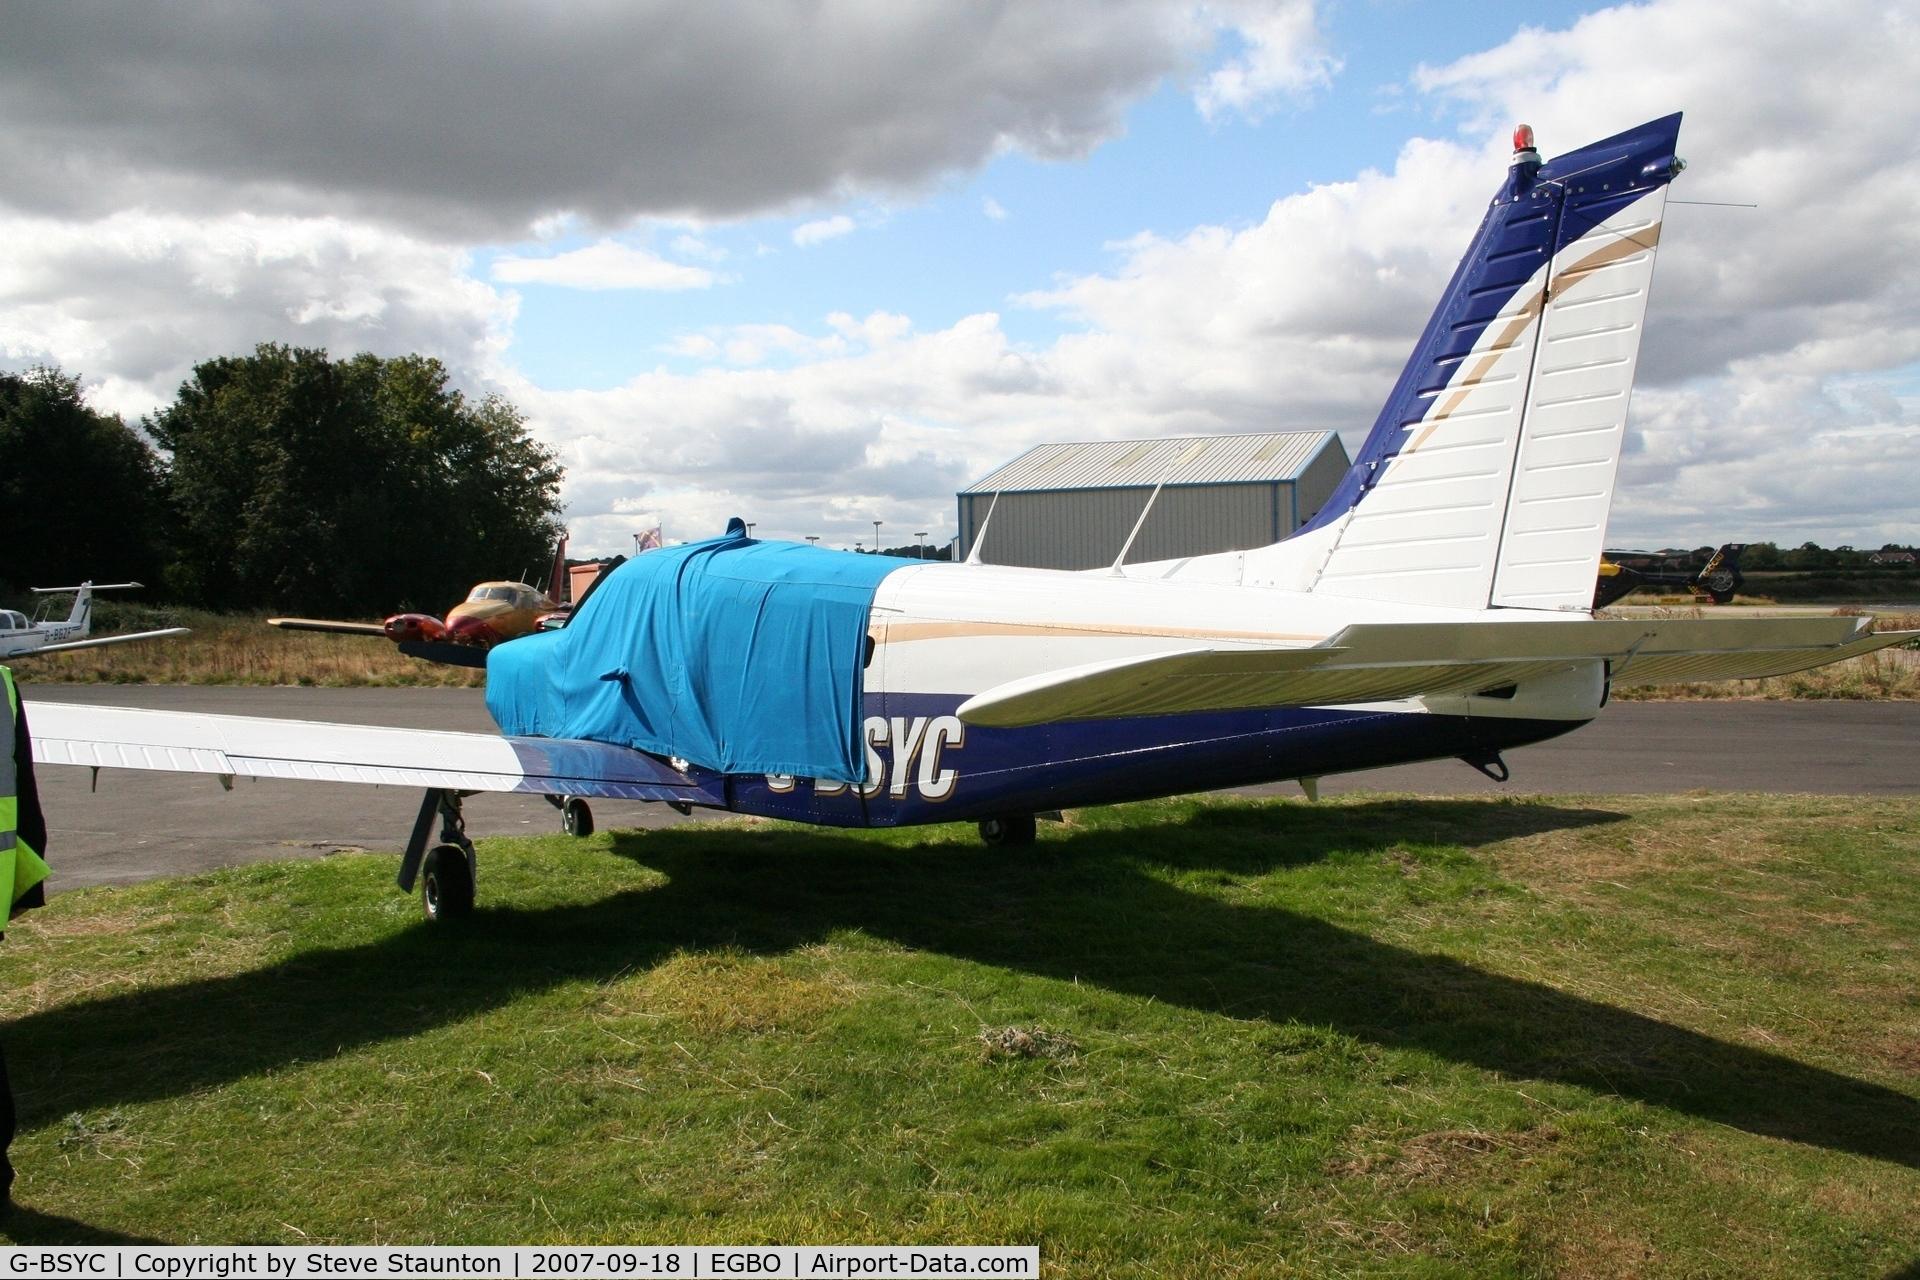 G-BSYC, 1977 Piper PA-32R-300 Cherokee Lance C/N 32R-7780159, Taken at Halfpenny Green 18th September 2007